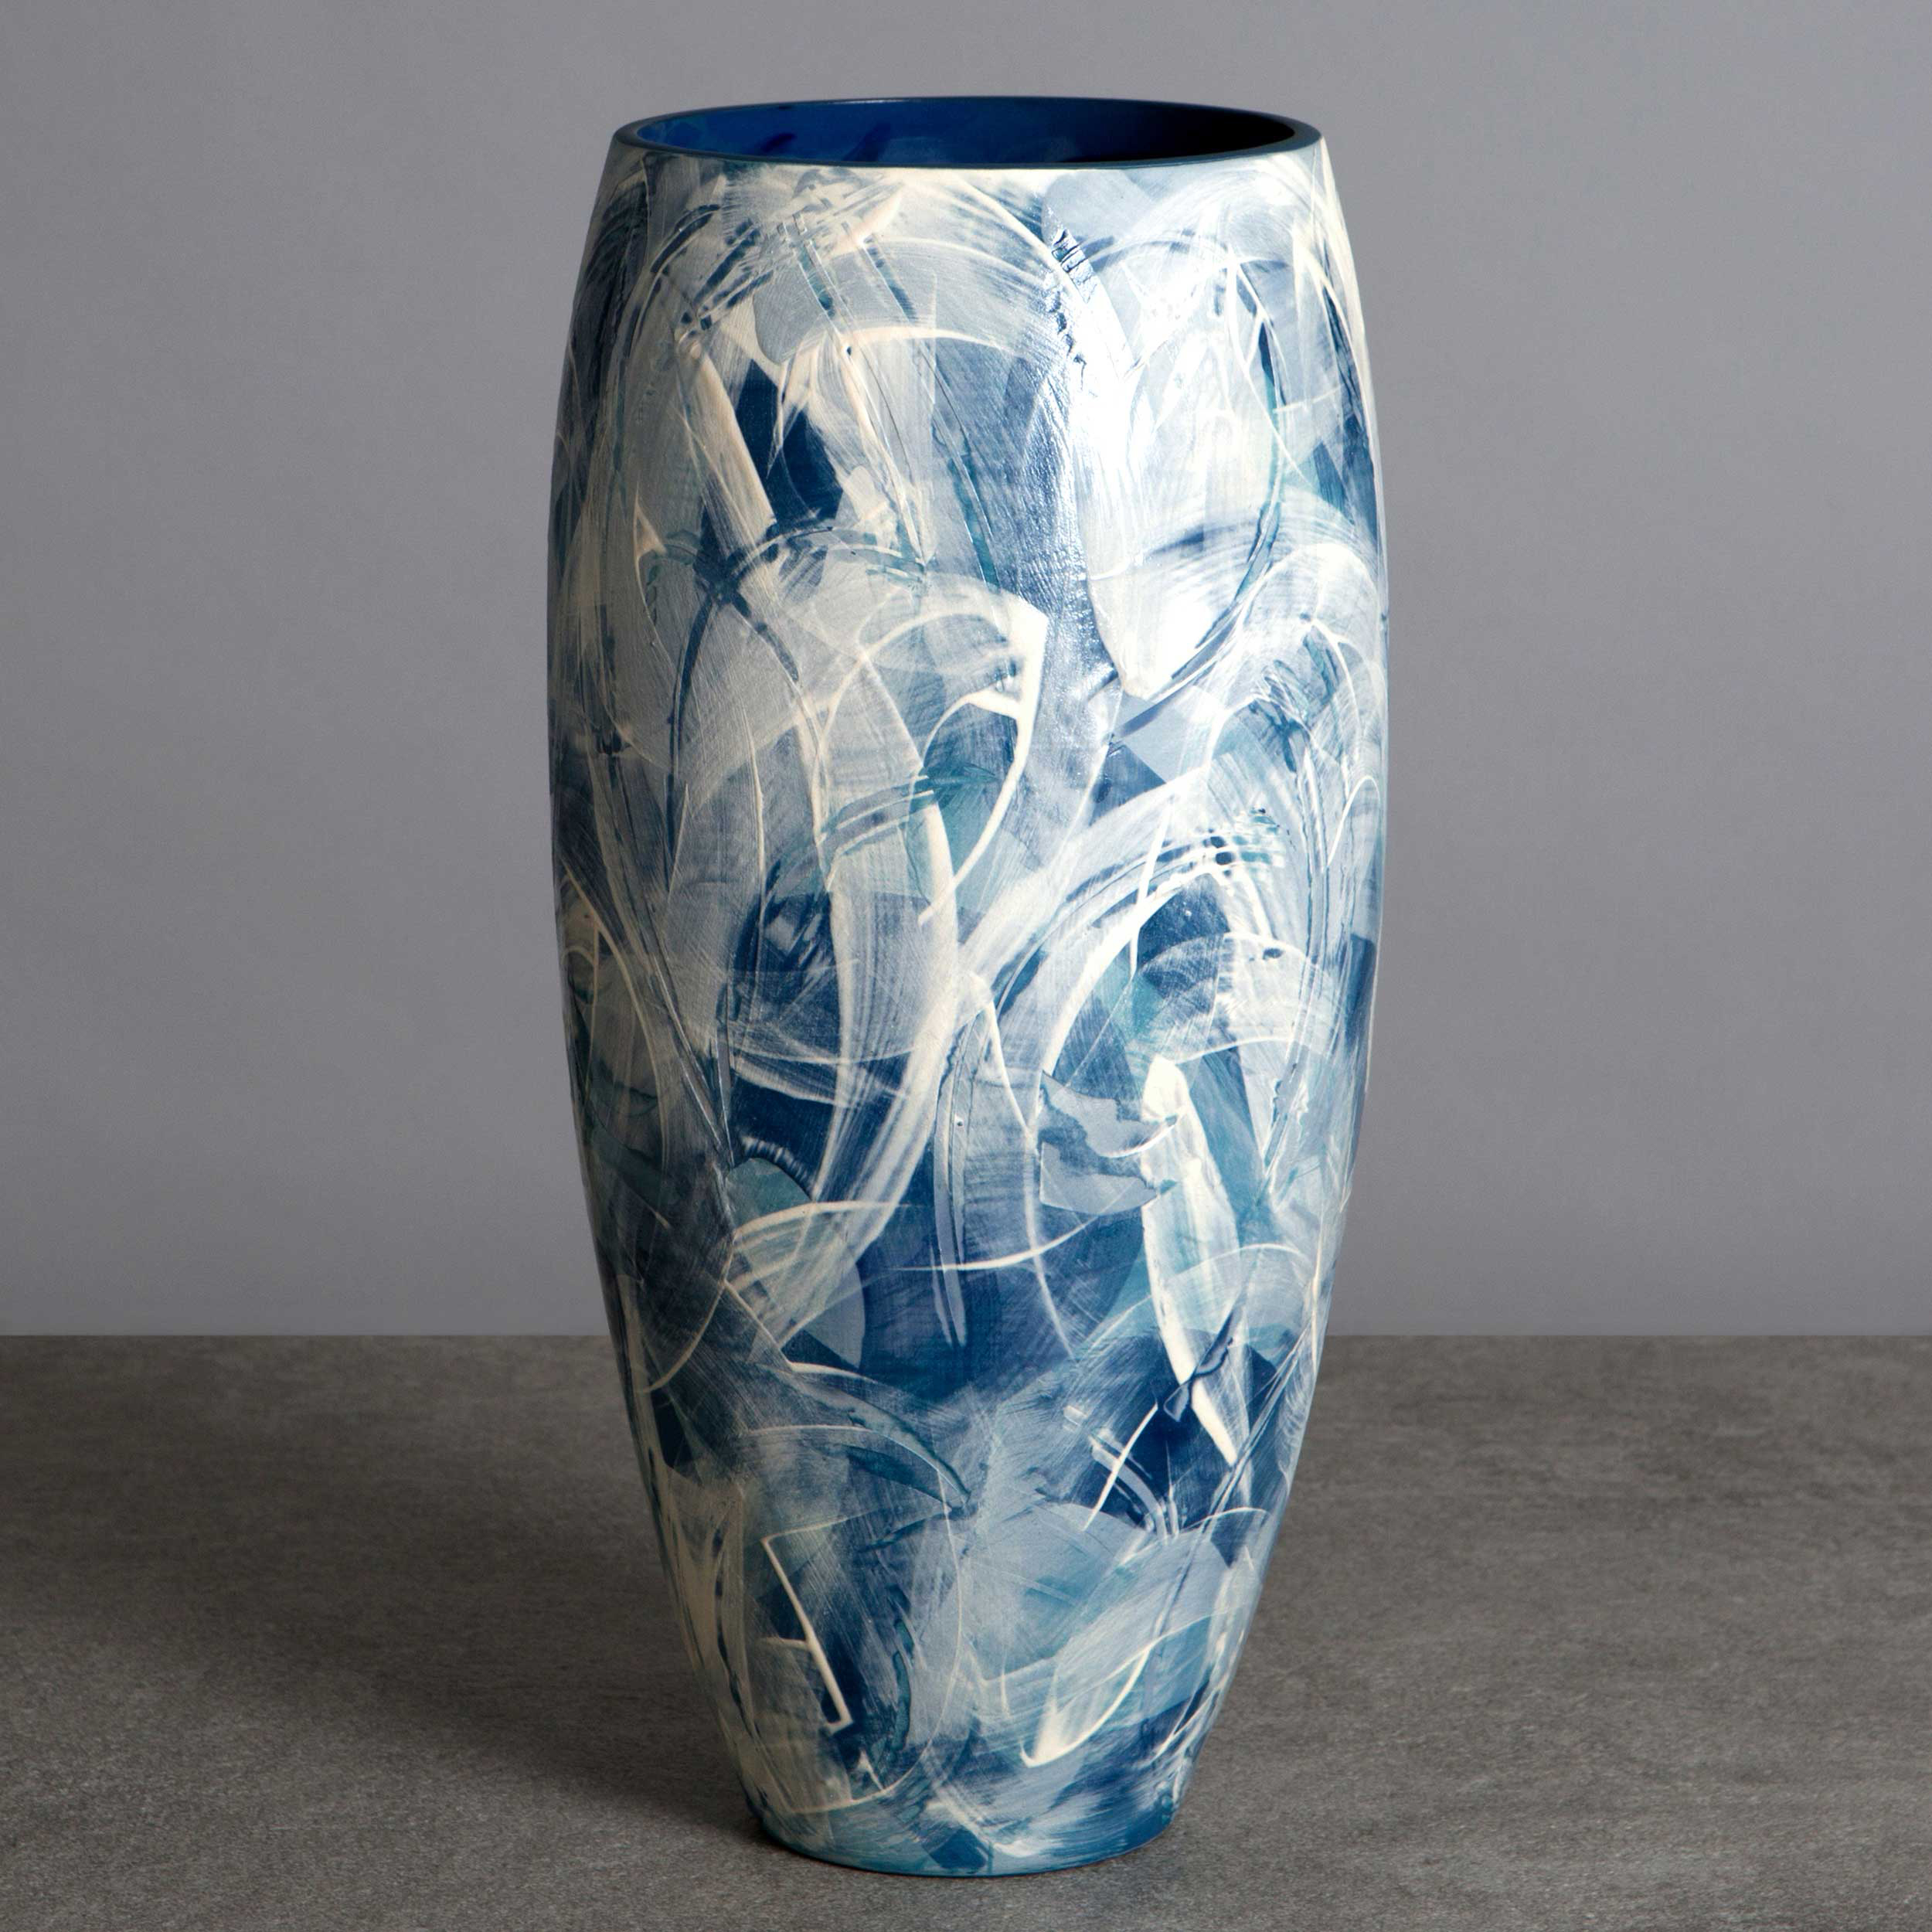 Seascape Wave Ceramic Vase by Rowena Gilbert